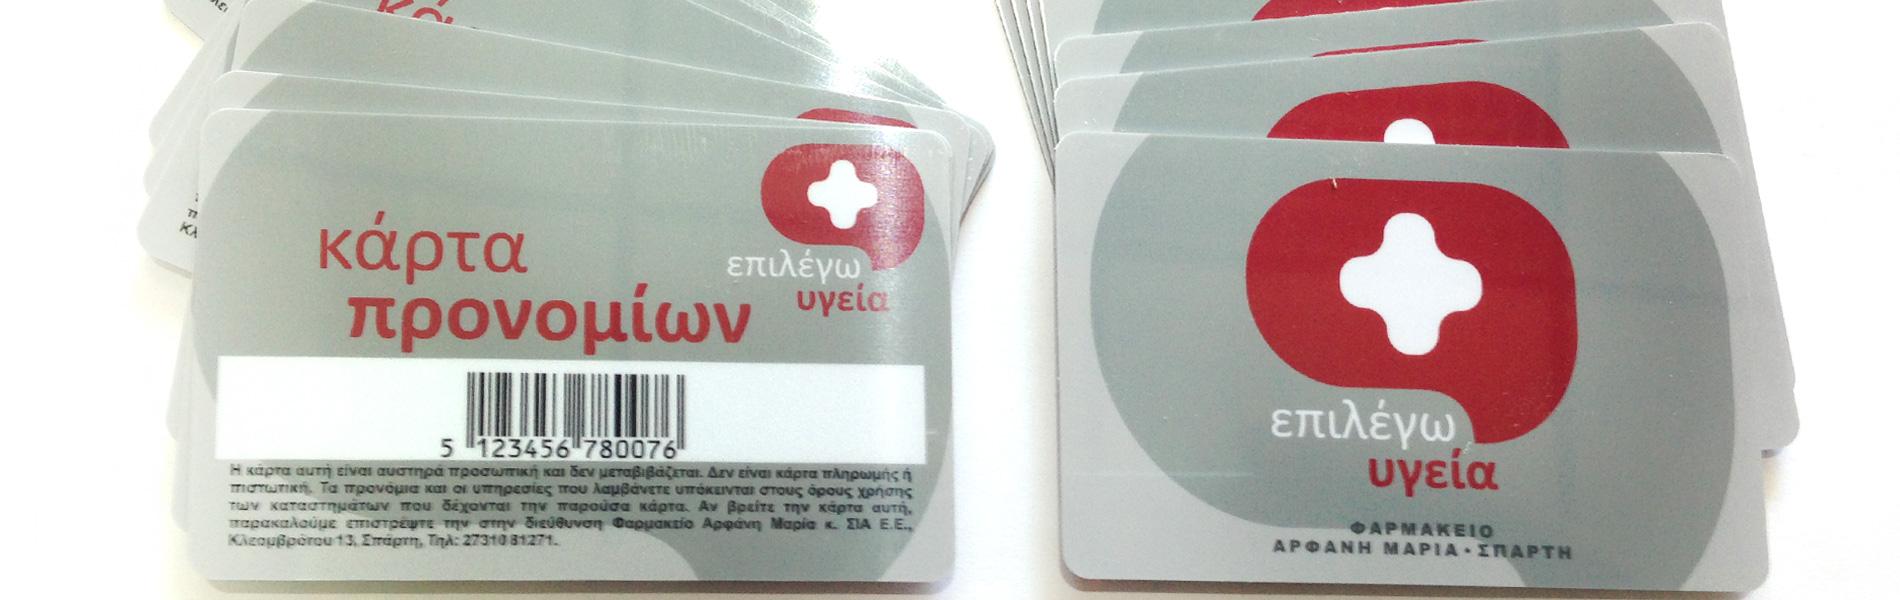 PVC Πλαστικες Καρτες